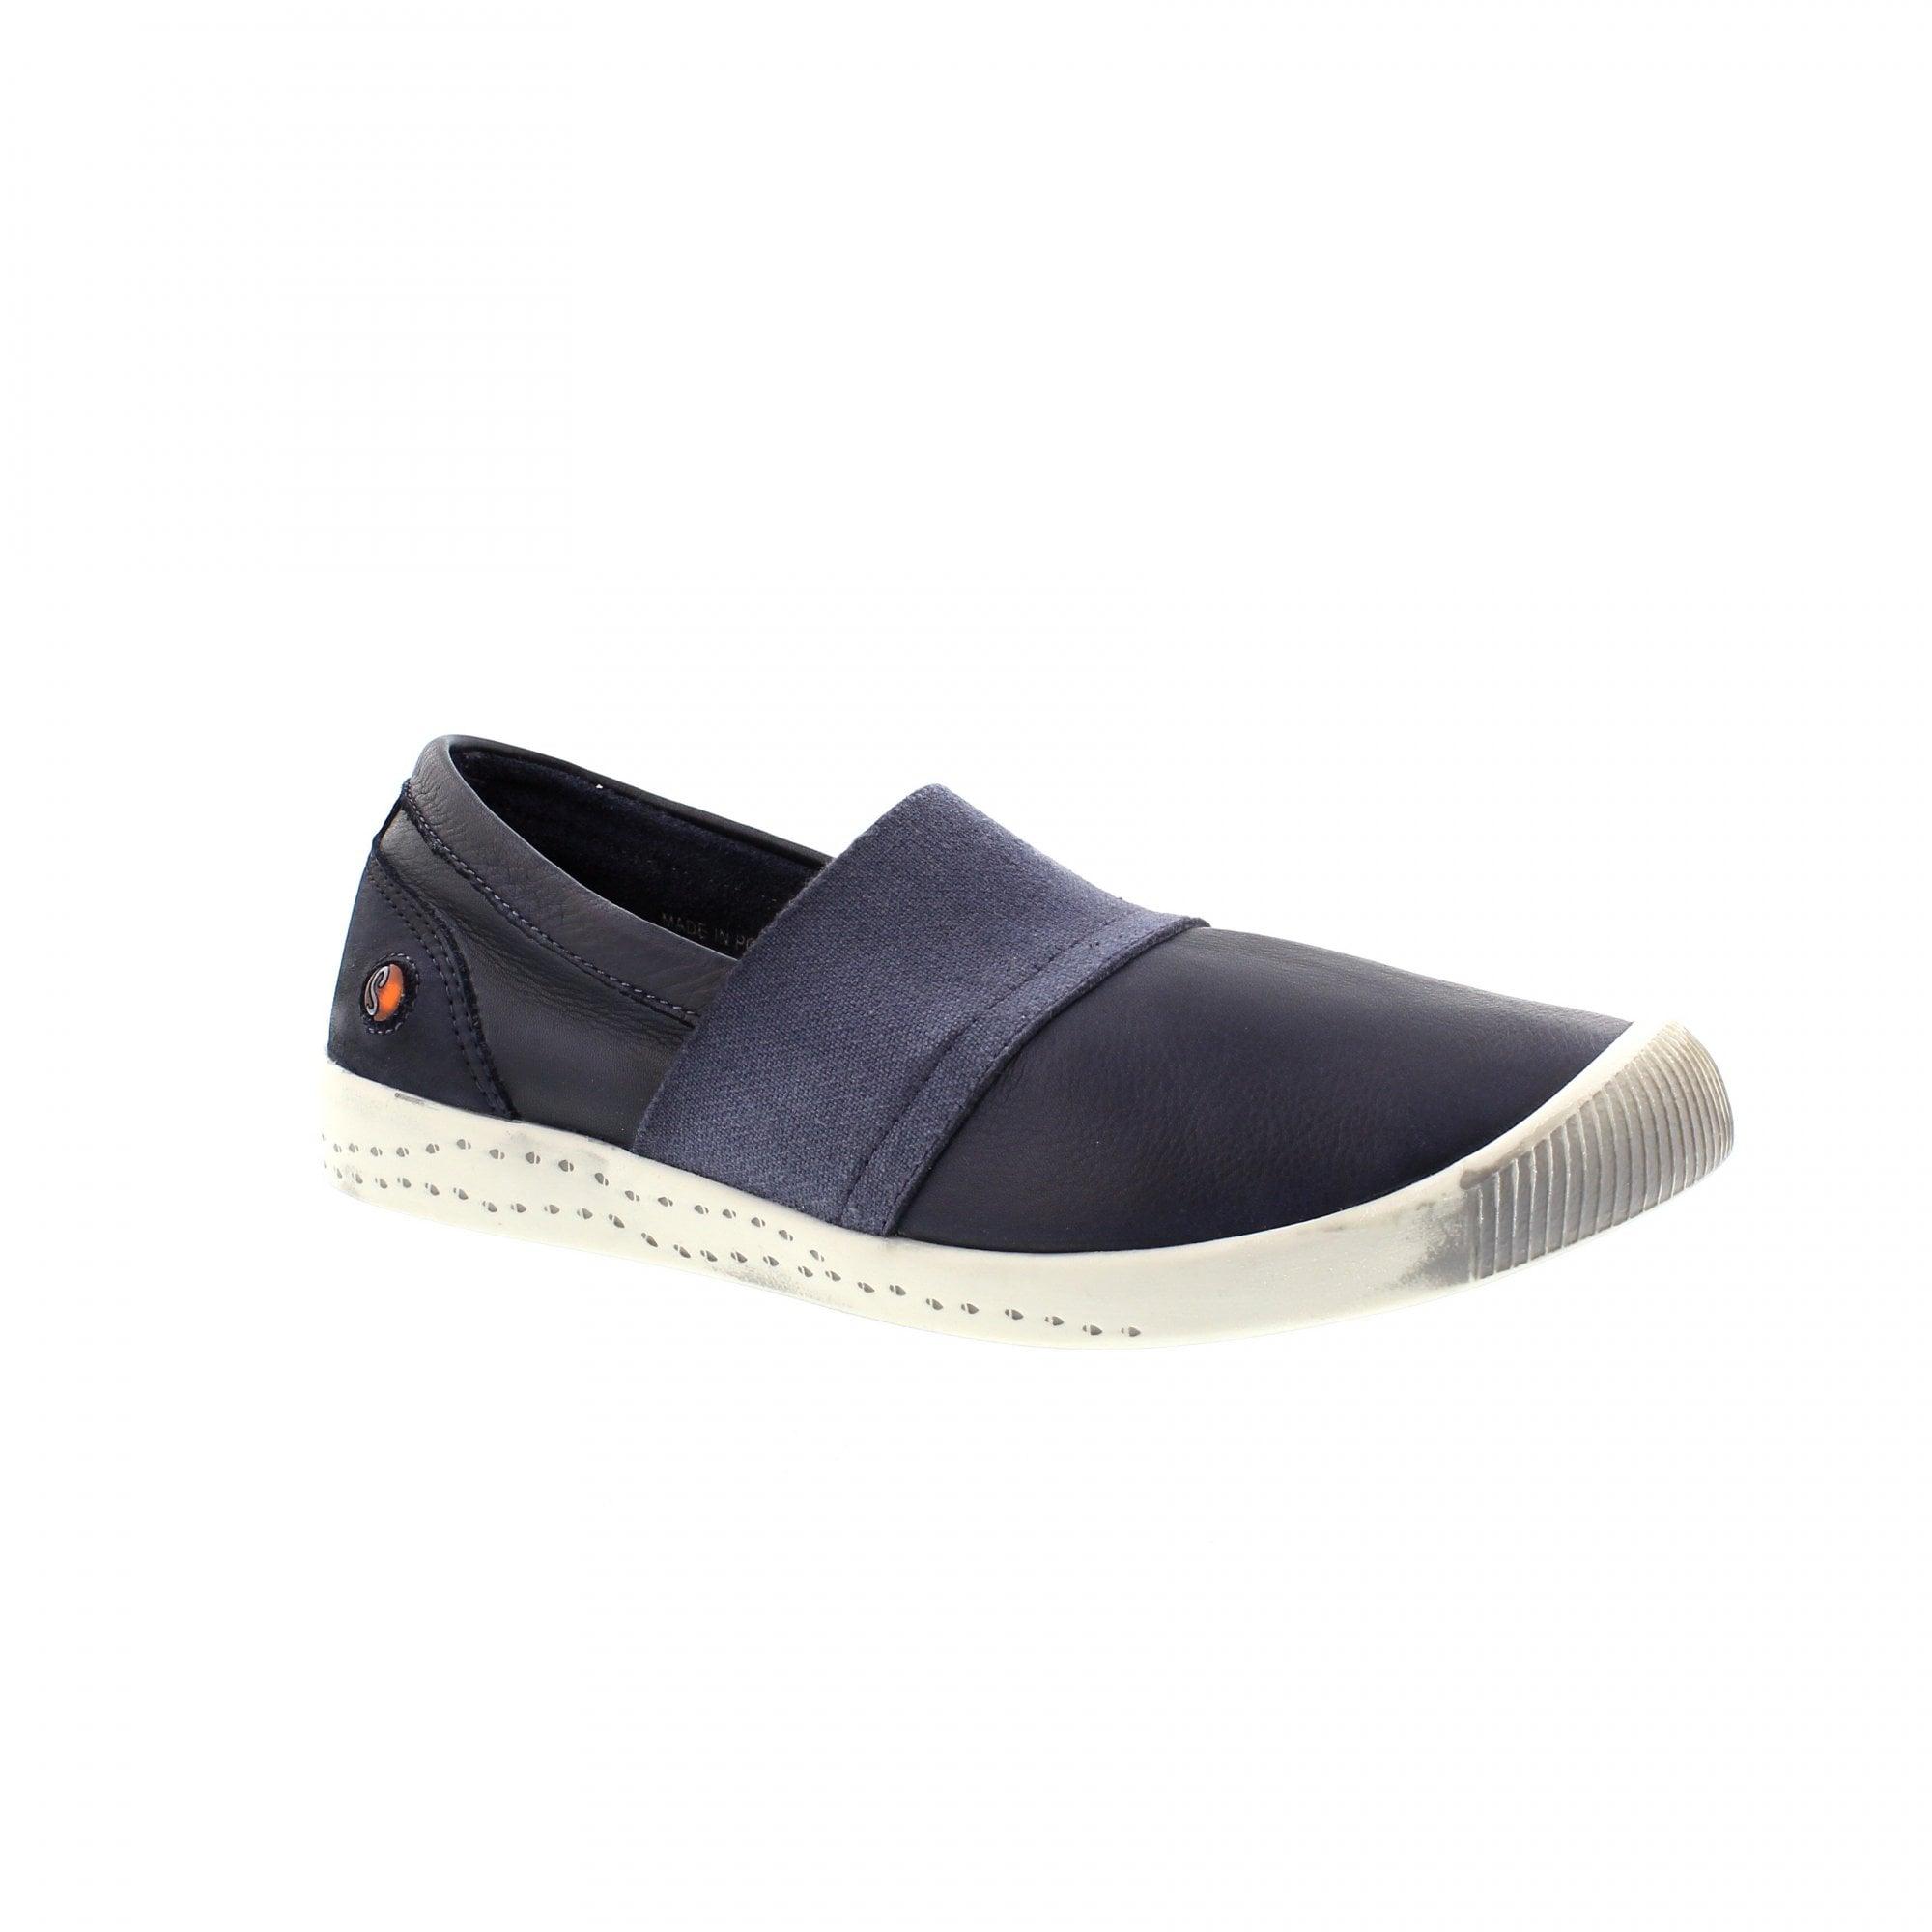 Softinos Ino Navy Leather Slip On